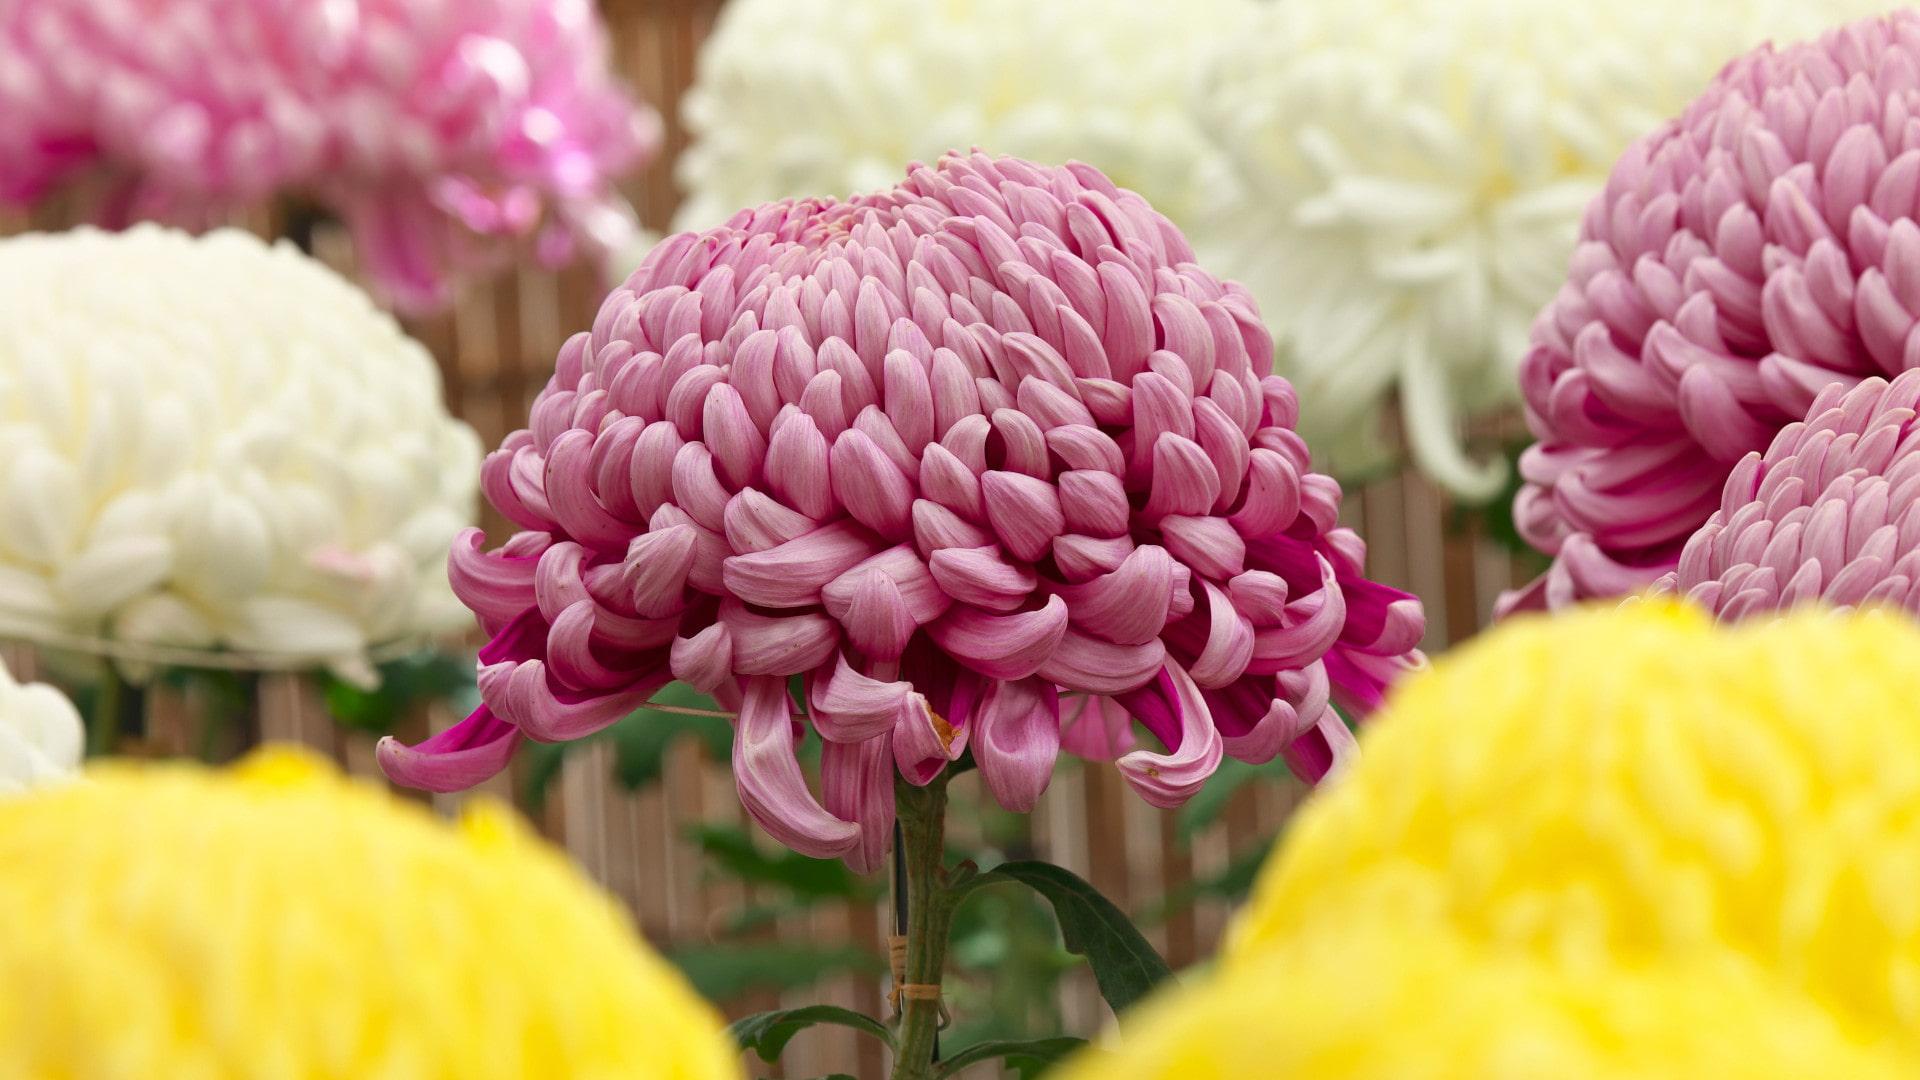 Chrysanthemium